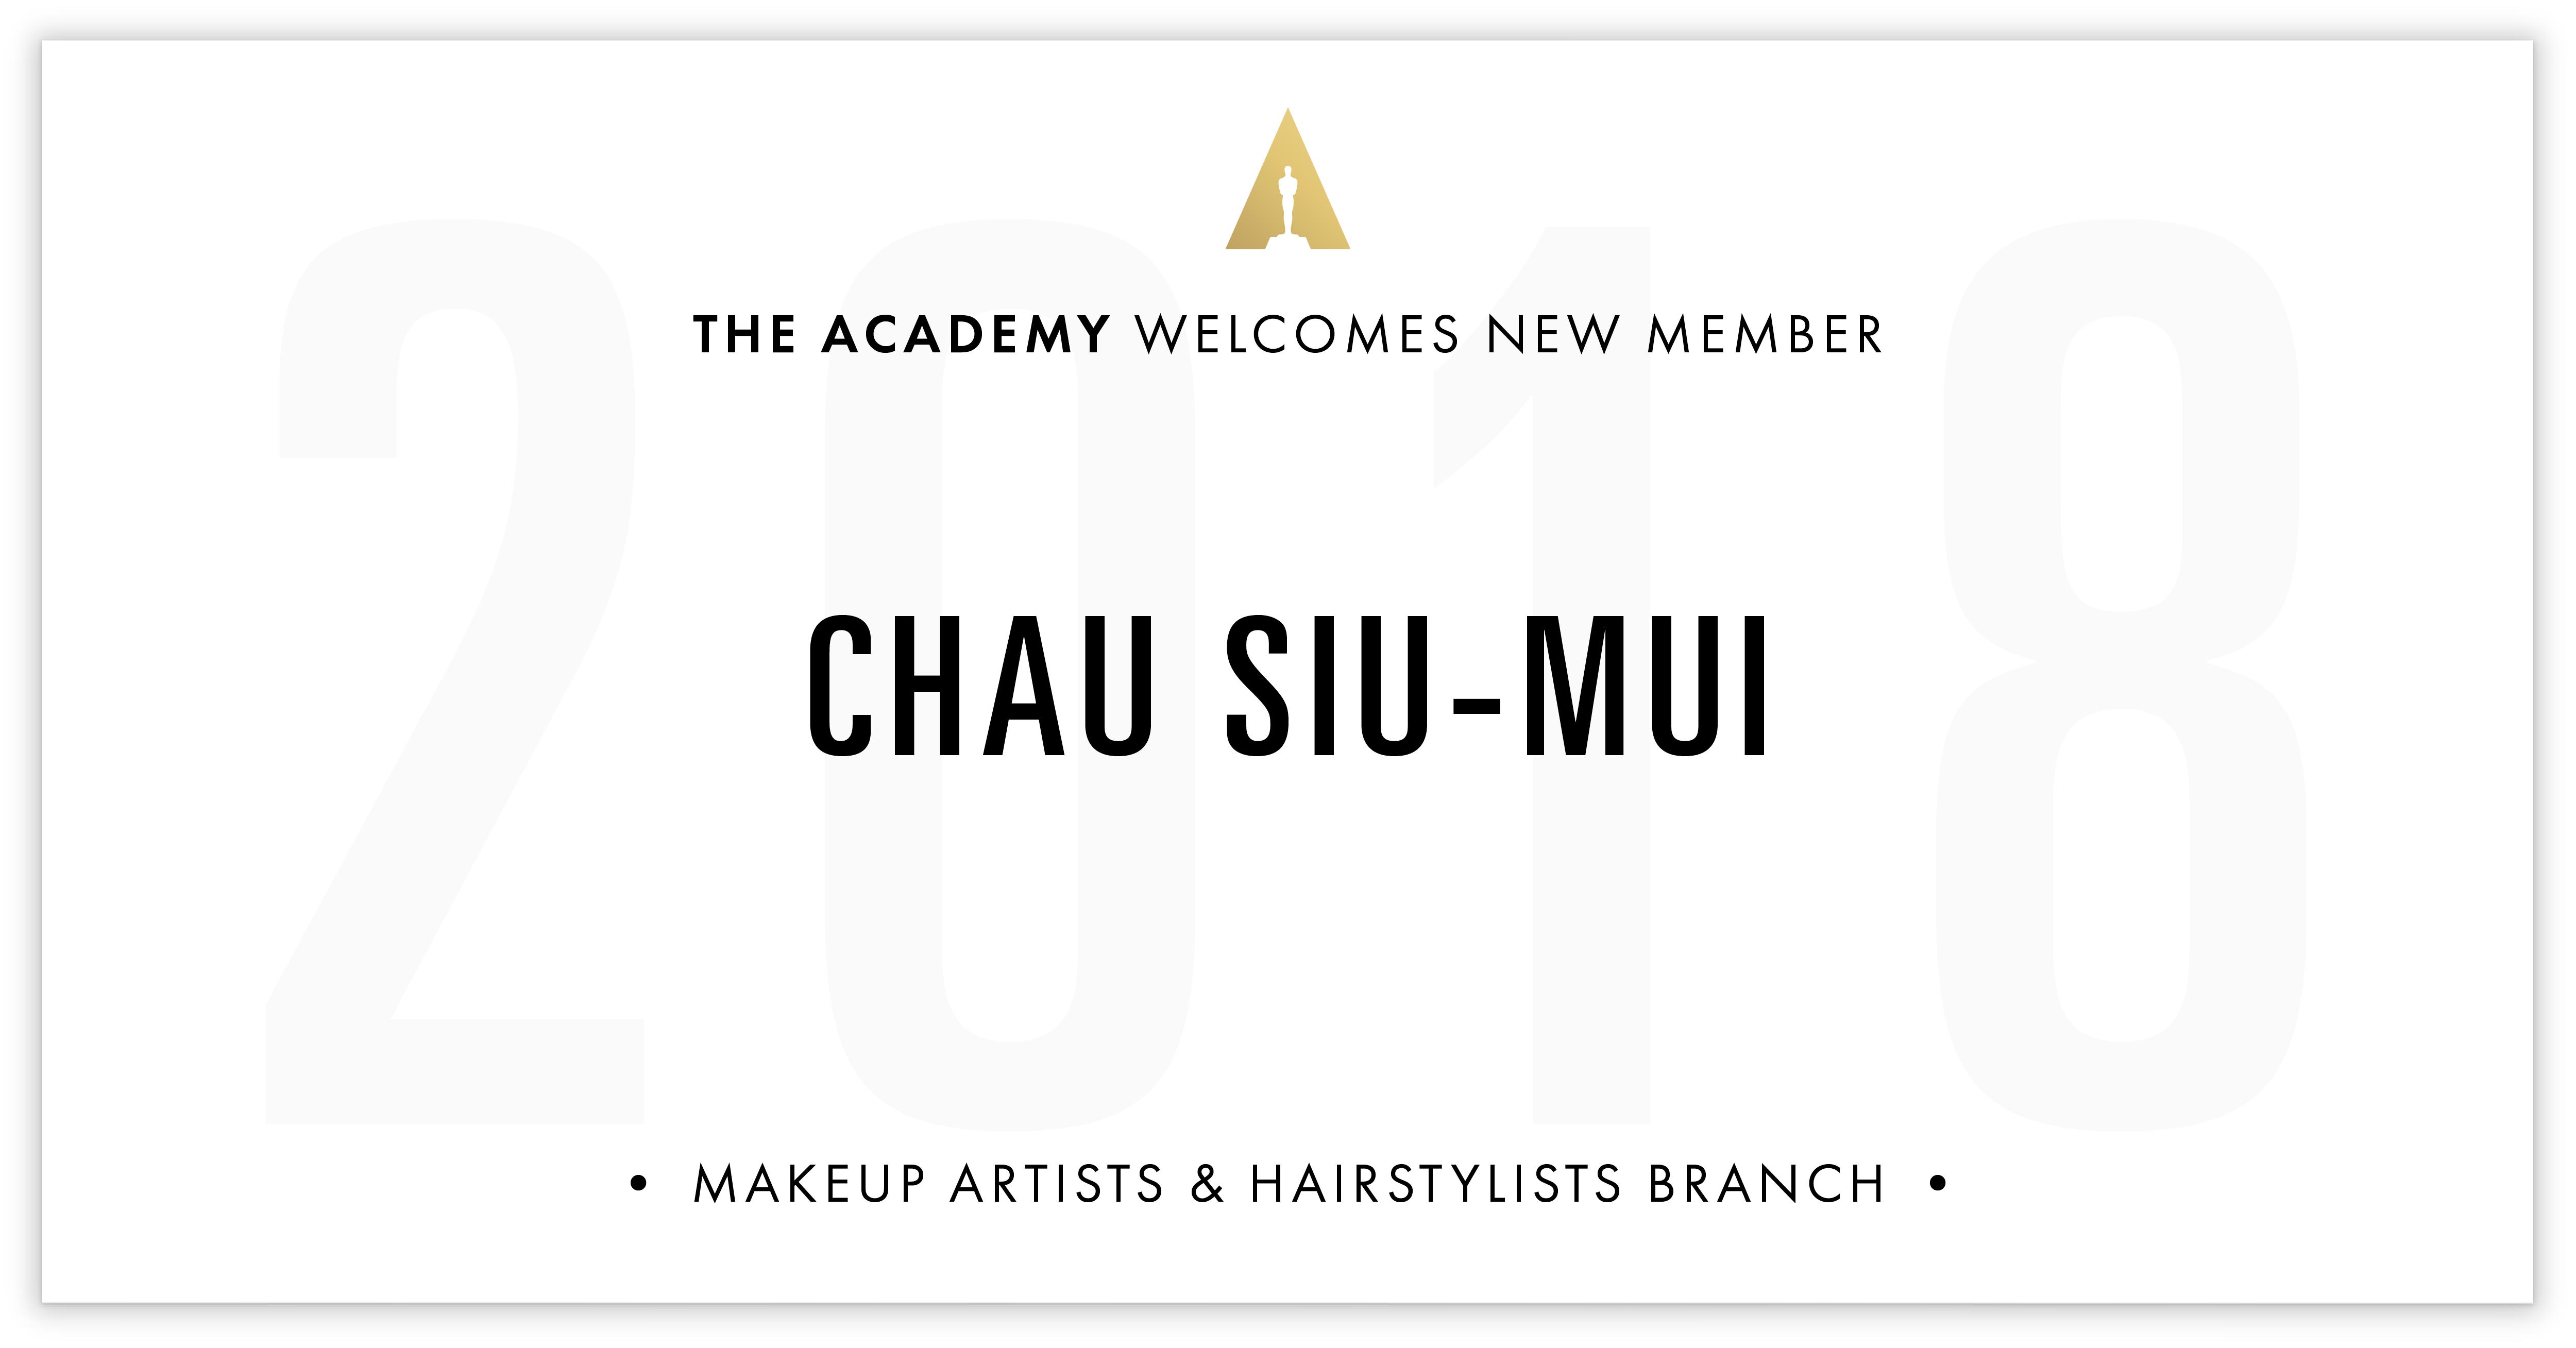 Chau Siu-Mui is invited!